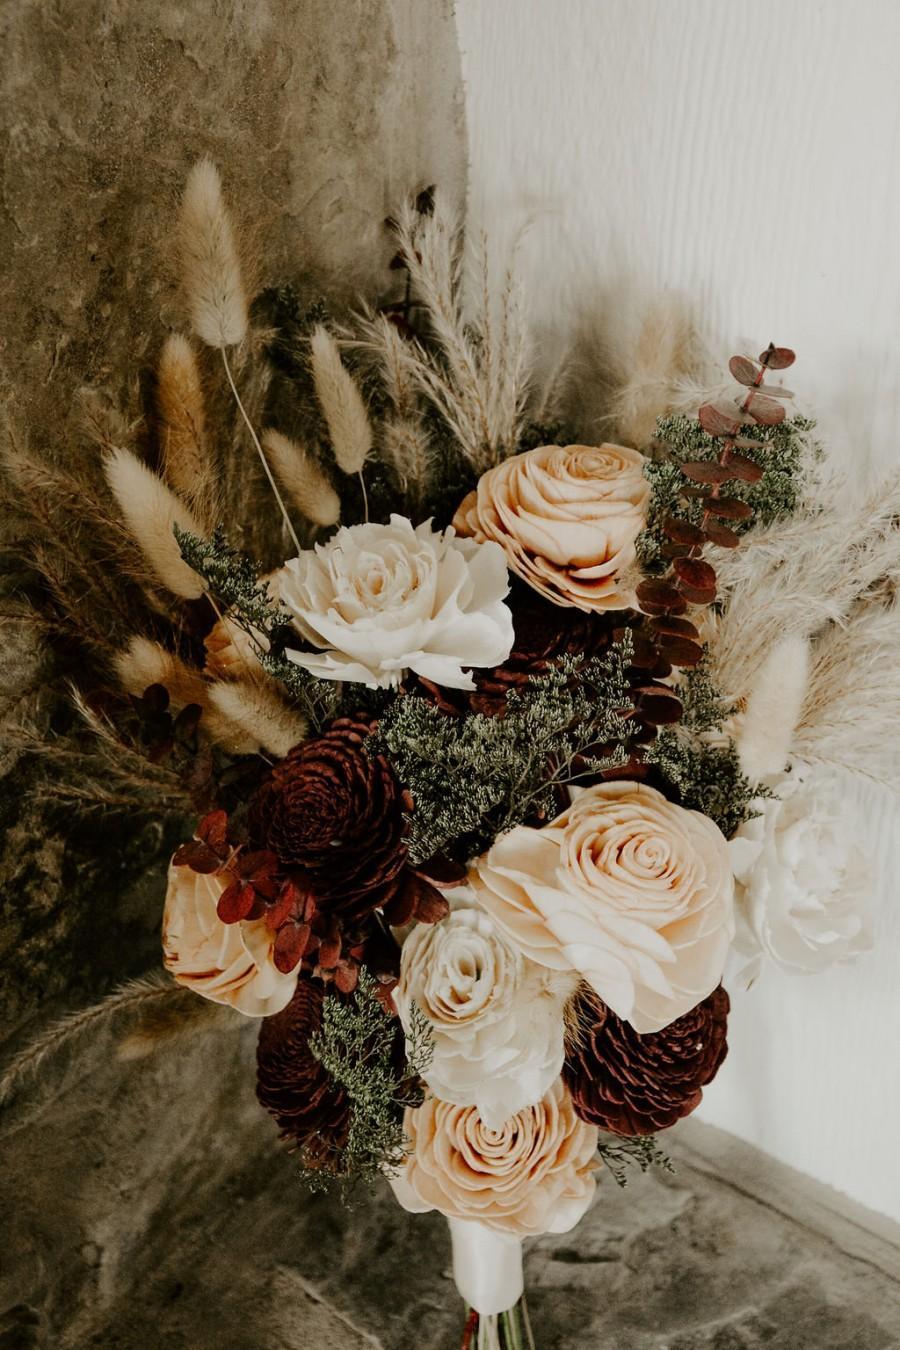 Wedding - Boho Bridal Bouquet, Burgundy, Olive, Copper, Pampas Grass Bouquet Wedding, Keepsake Bridal Bouquet, Burgundy Flower Bouquet